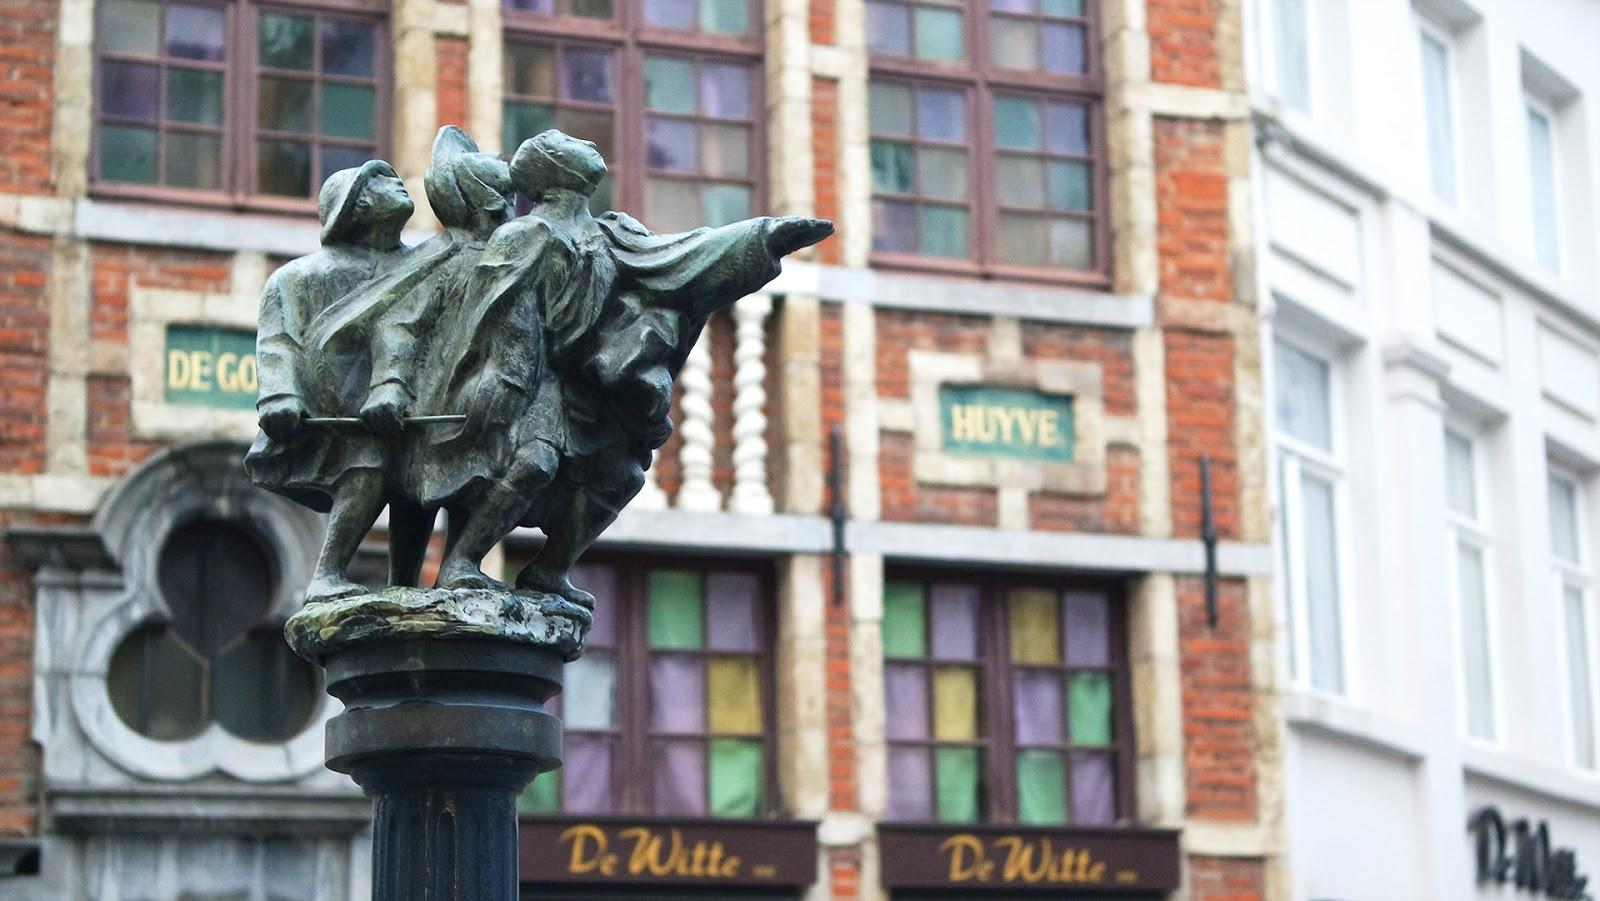 Statue in Bruxelles street